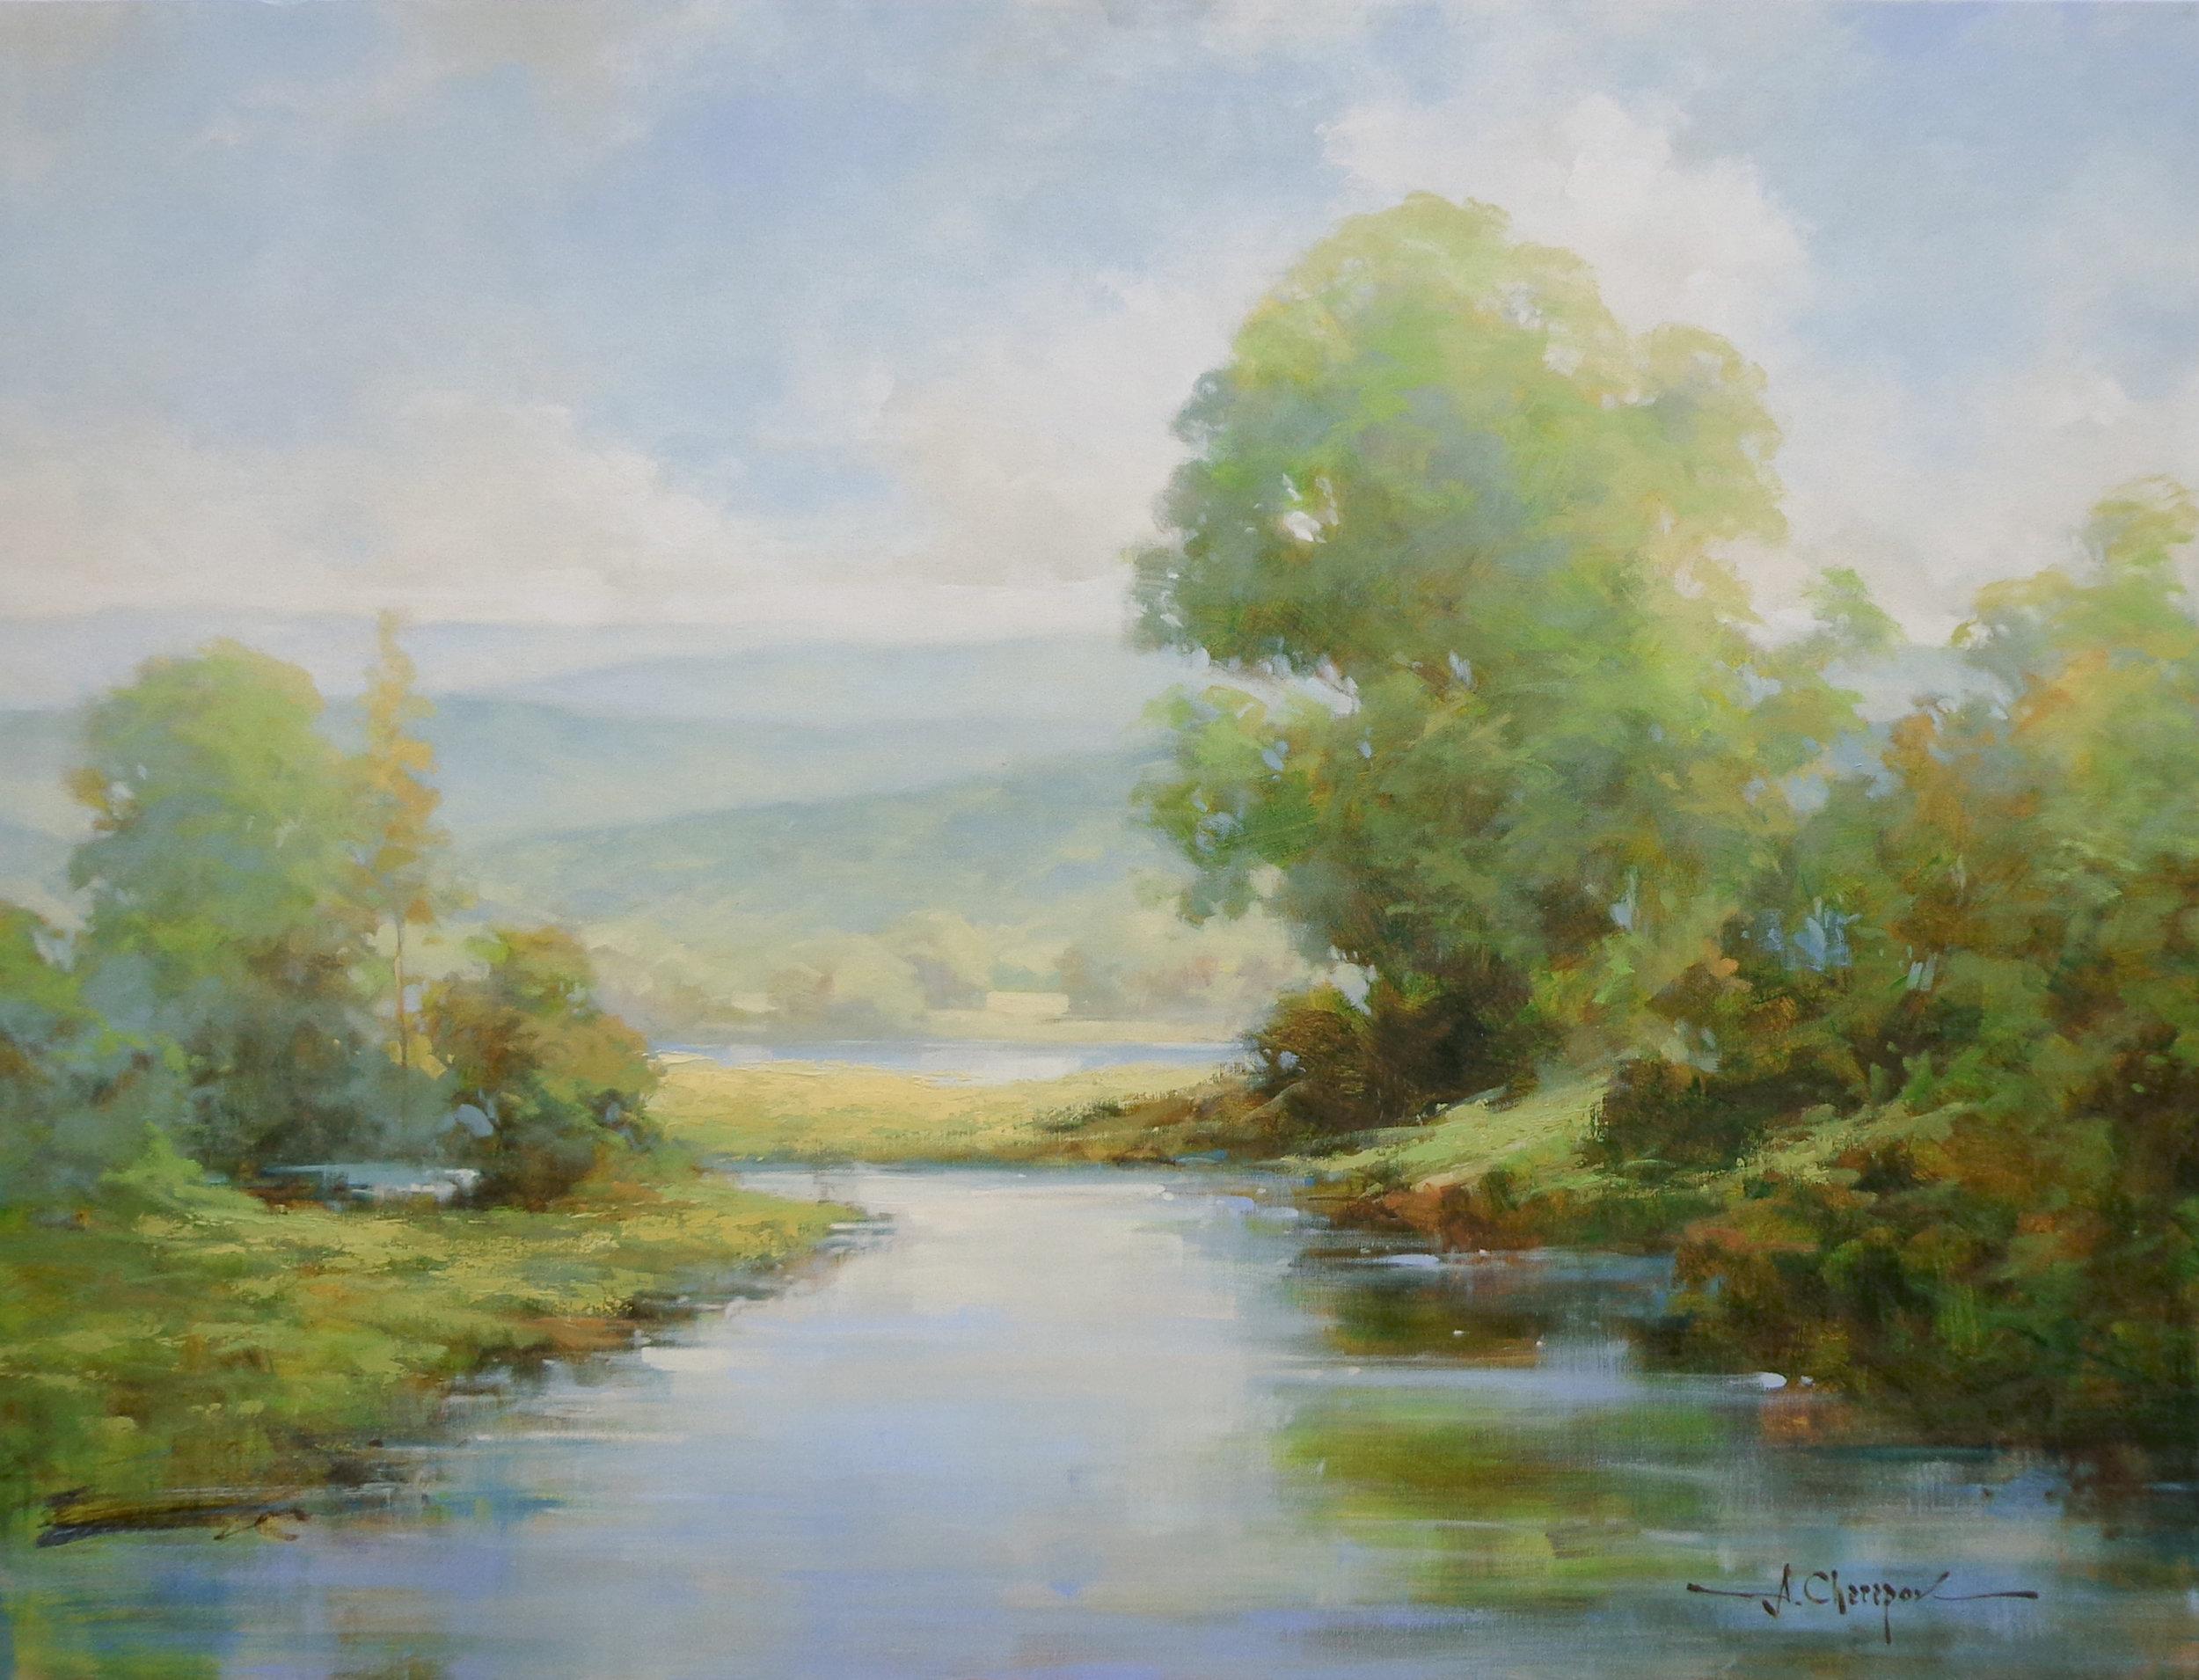 White Sunset at the River I 36x48